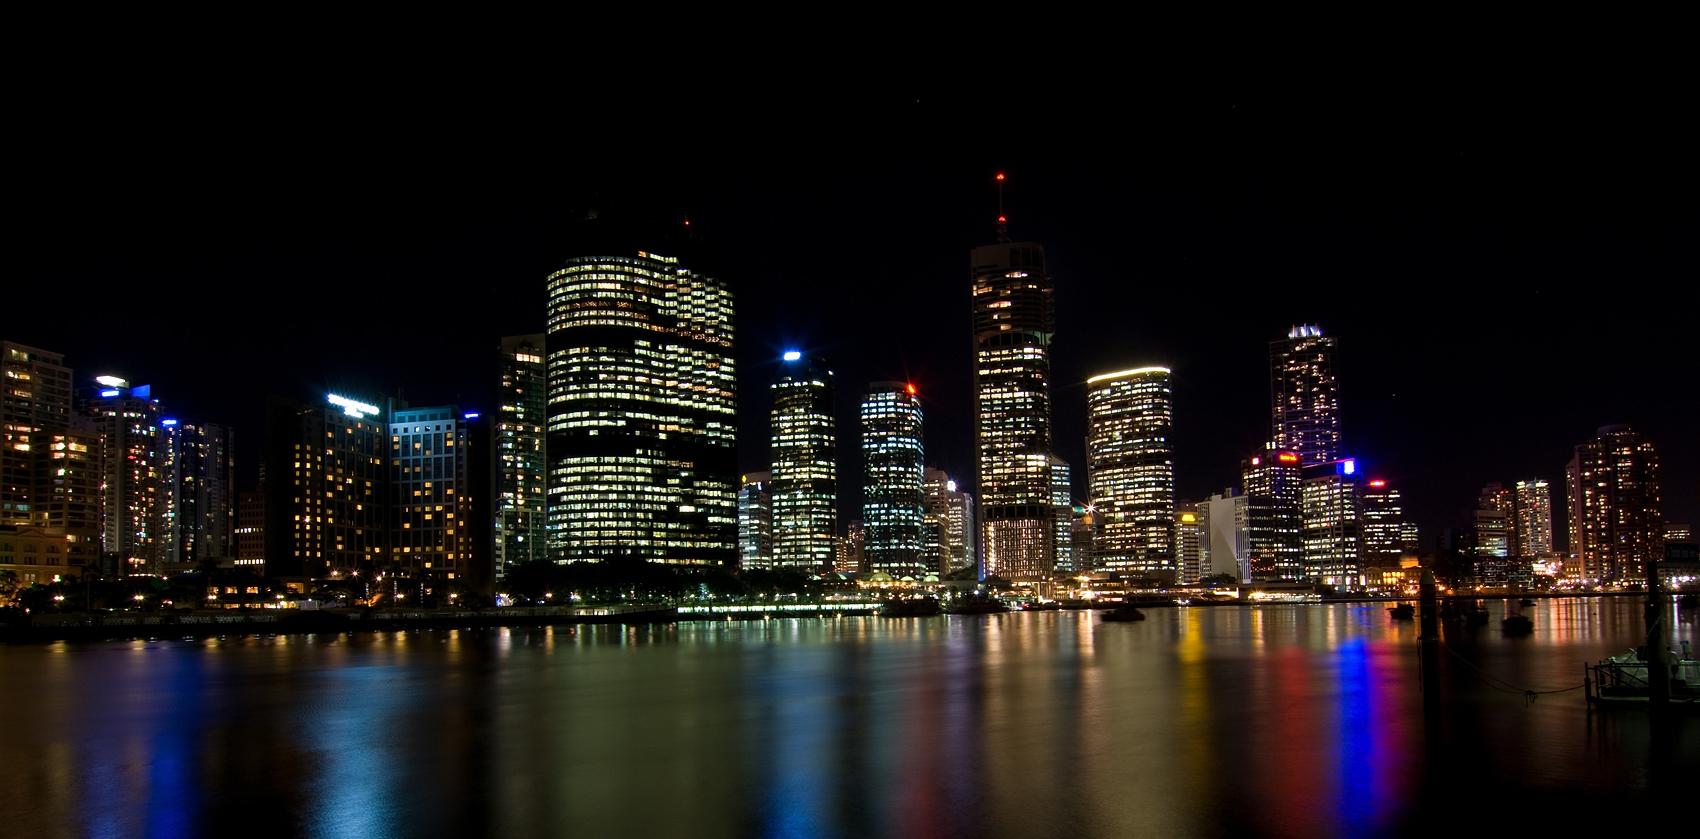 night_skyline.jpg